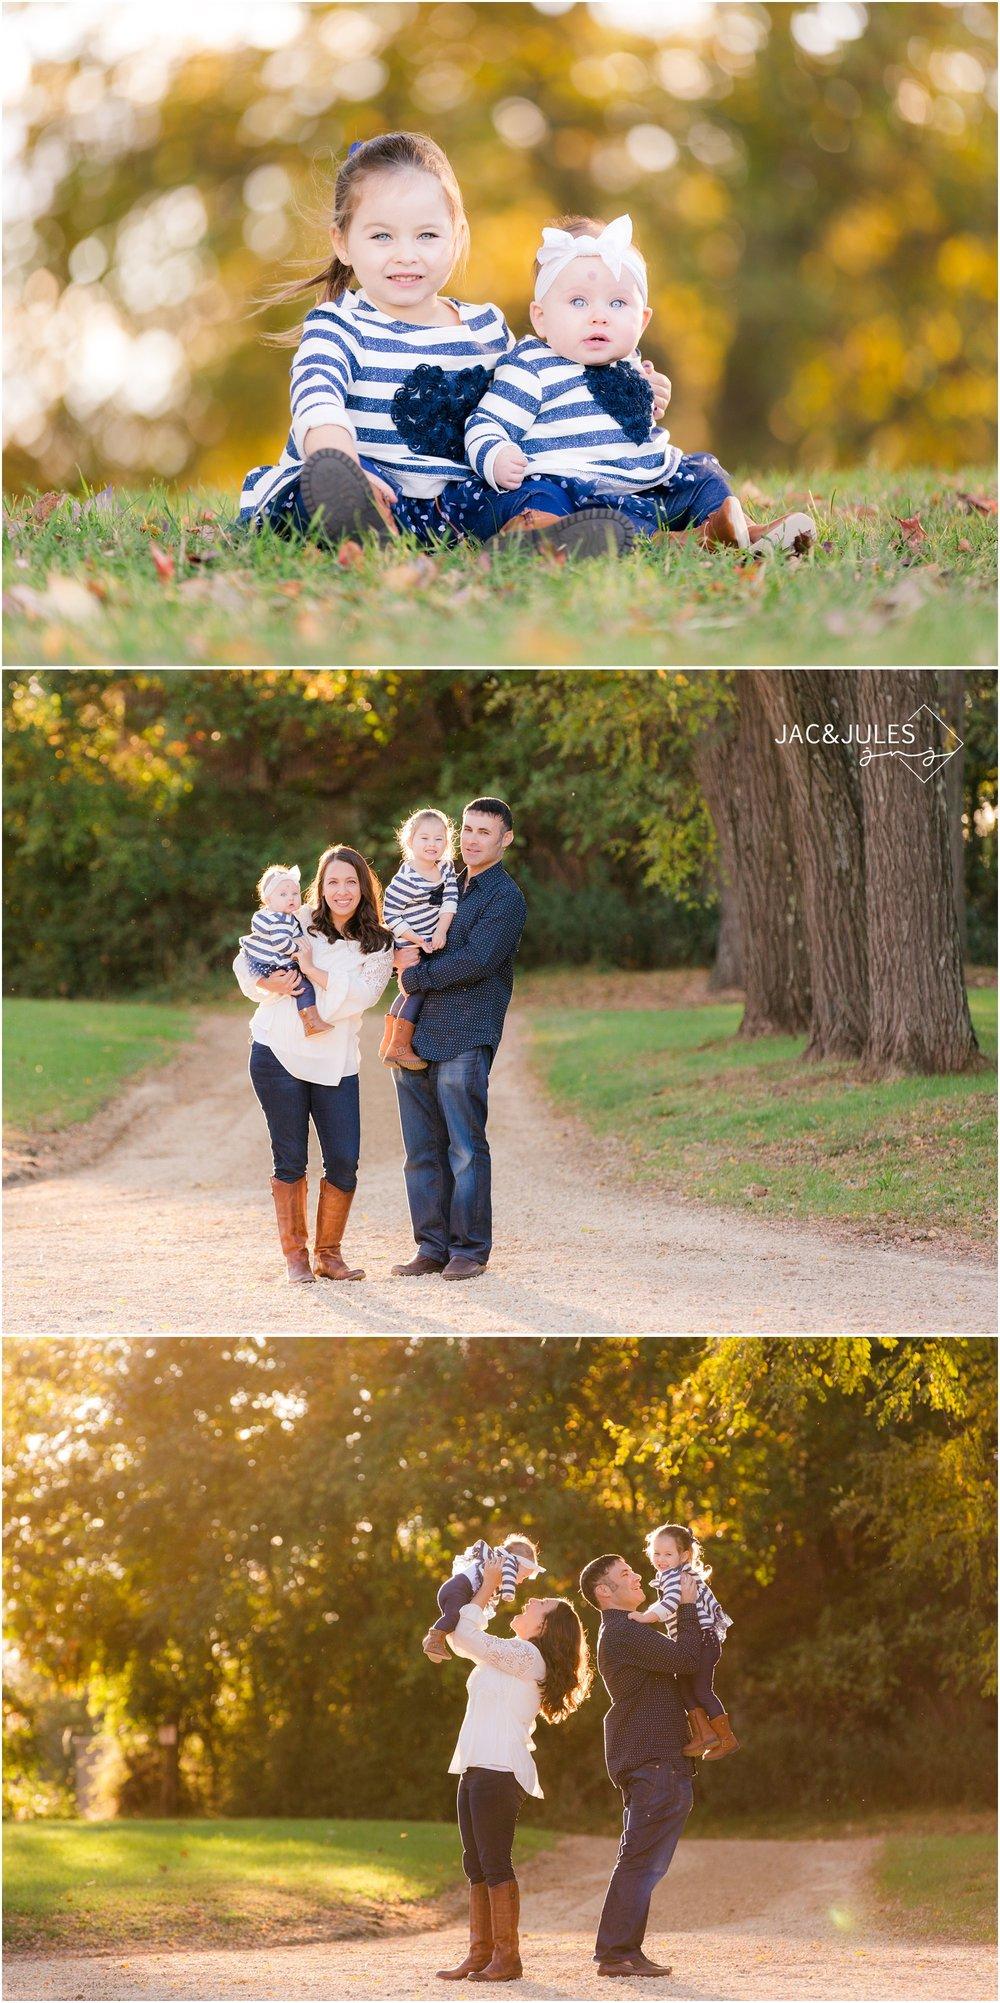 fun family photos at bayonet farm in holmdel, nj.